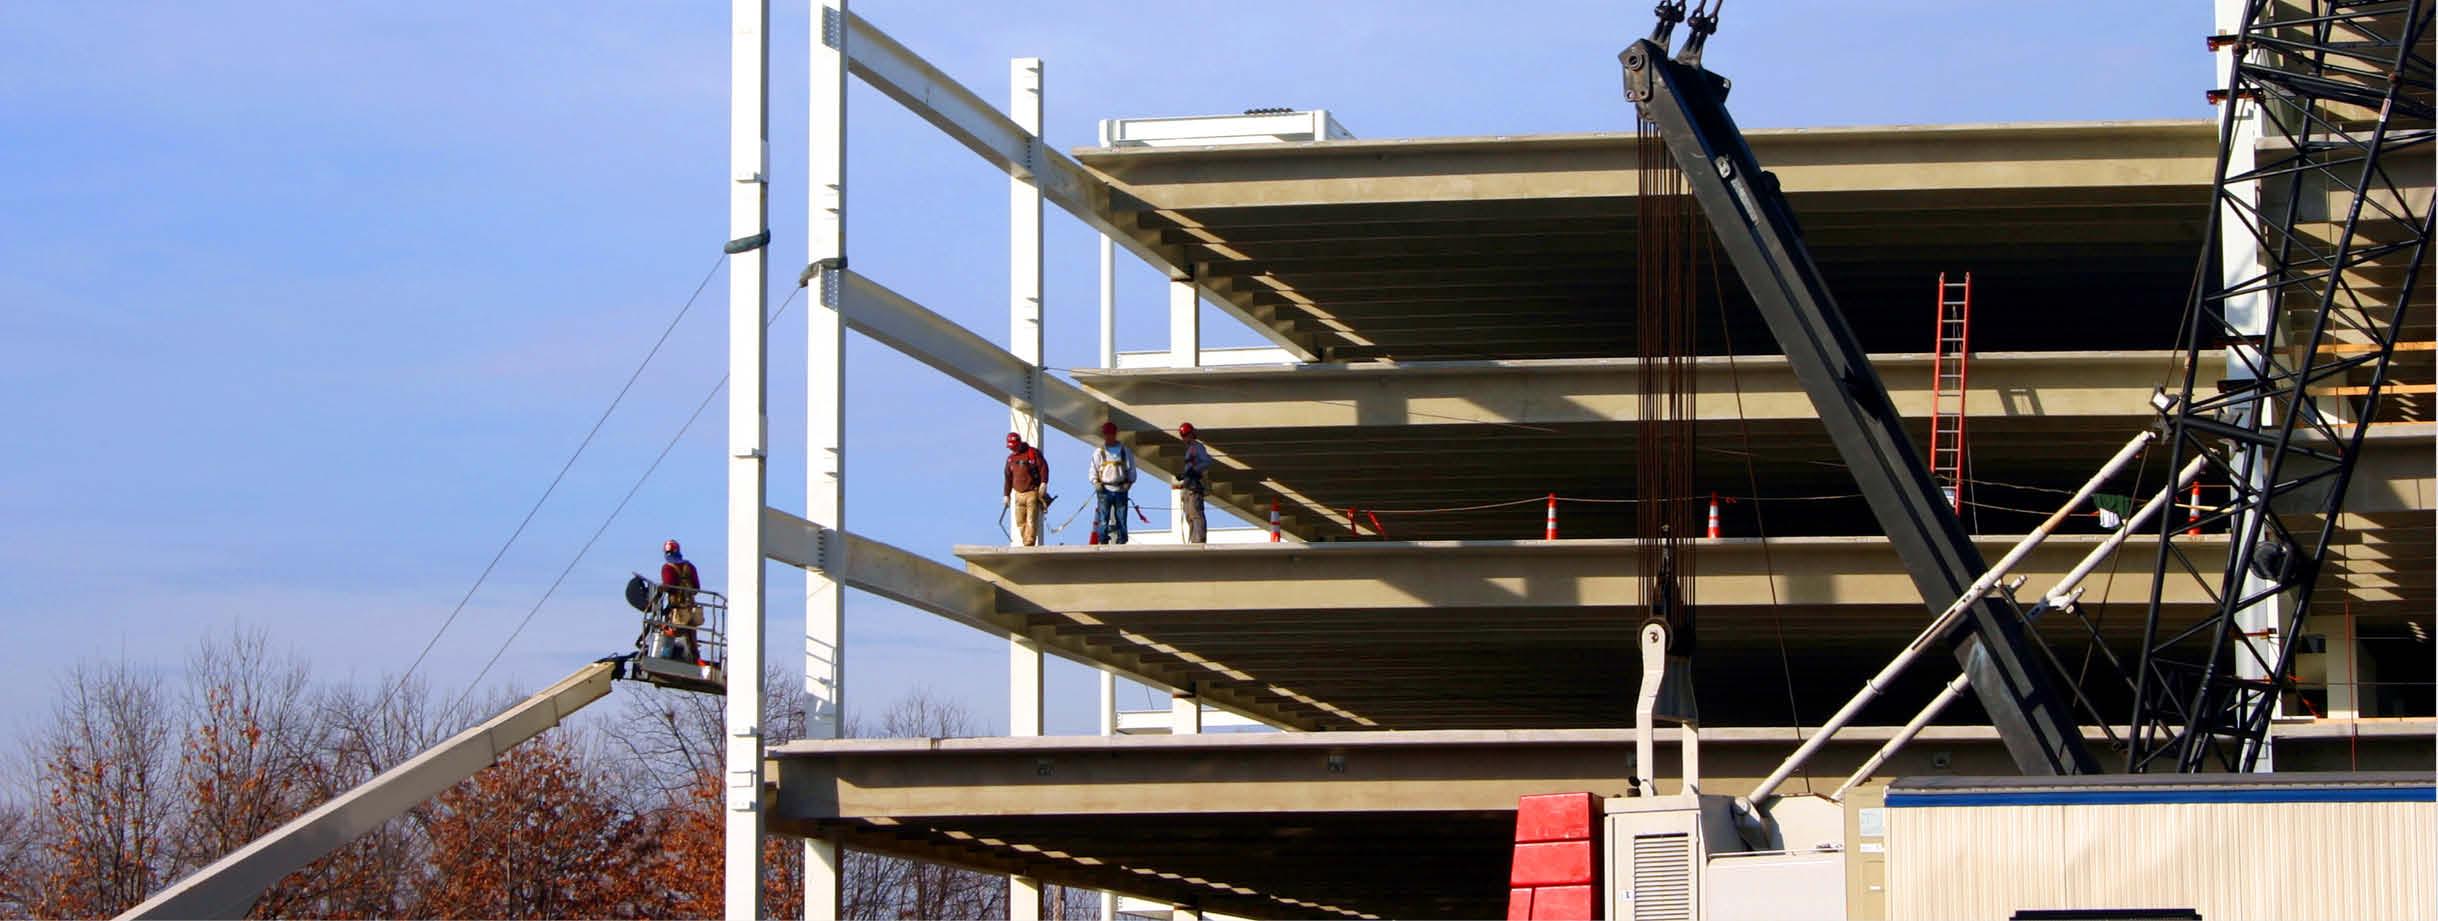 register construction register construction, construction company lakeland florida